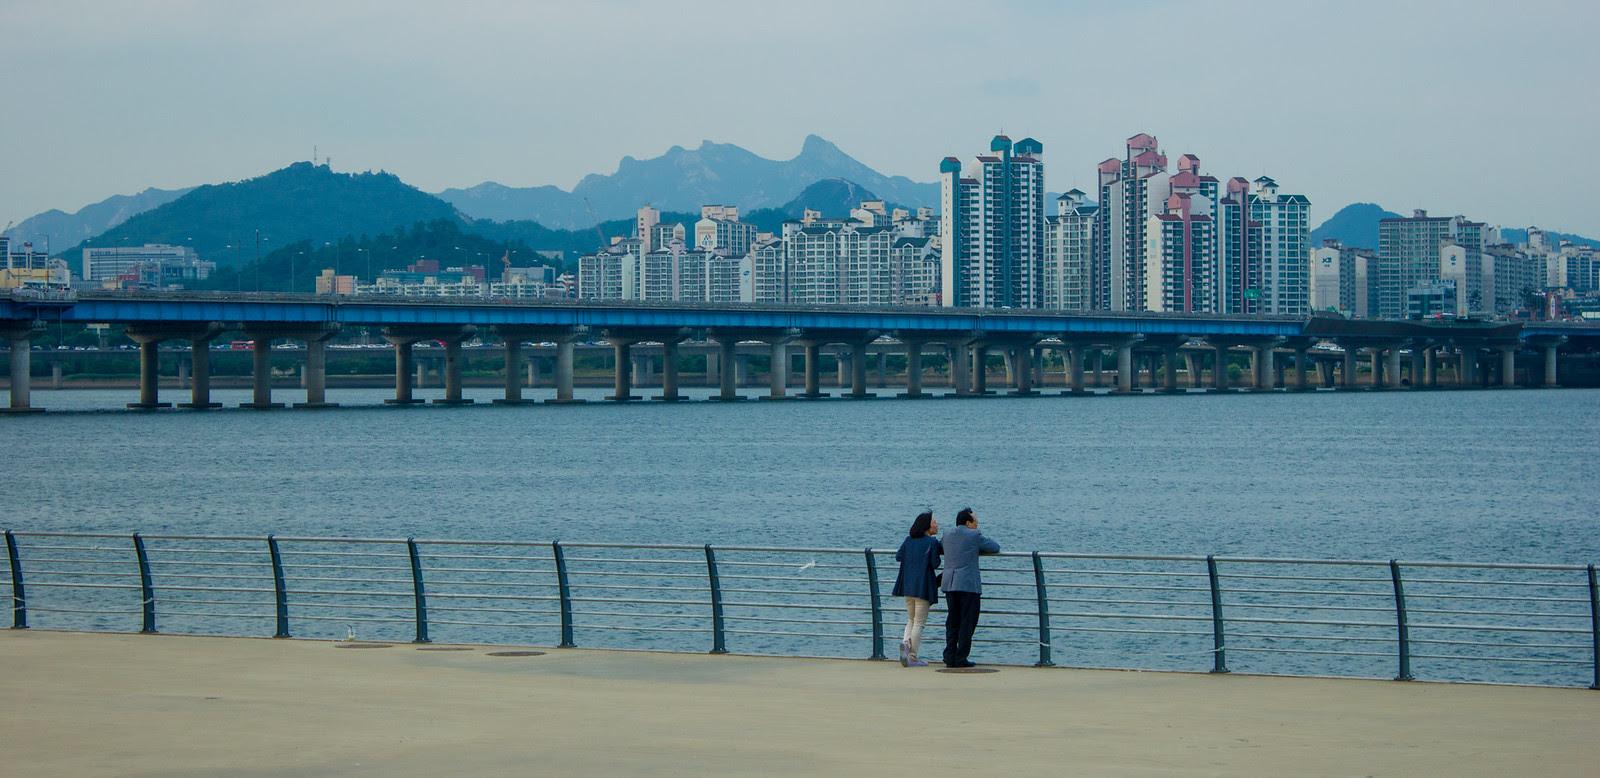 Across the Han River